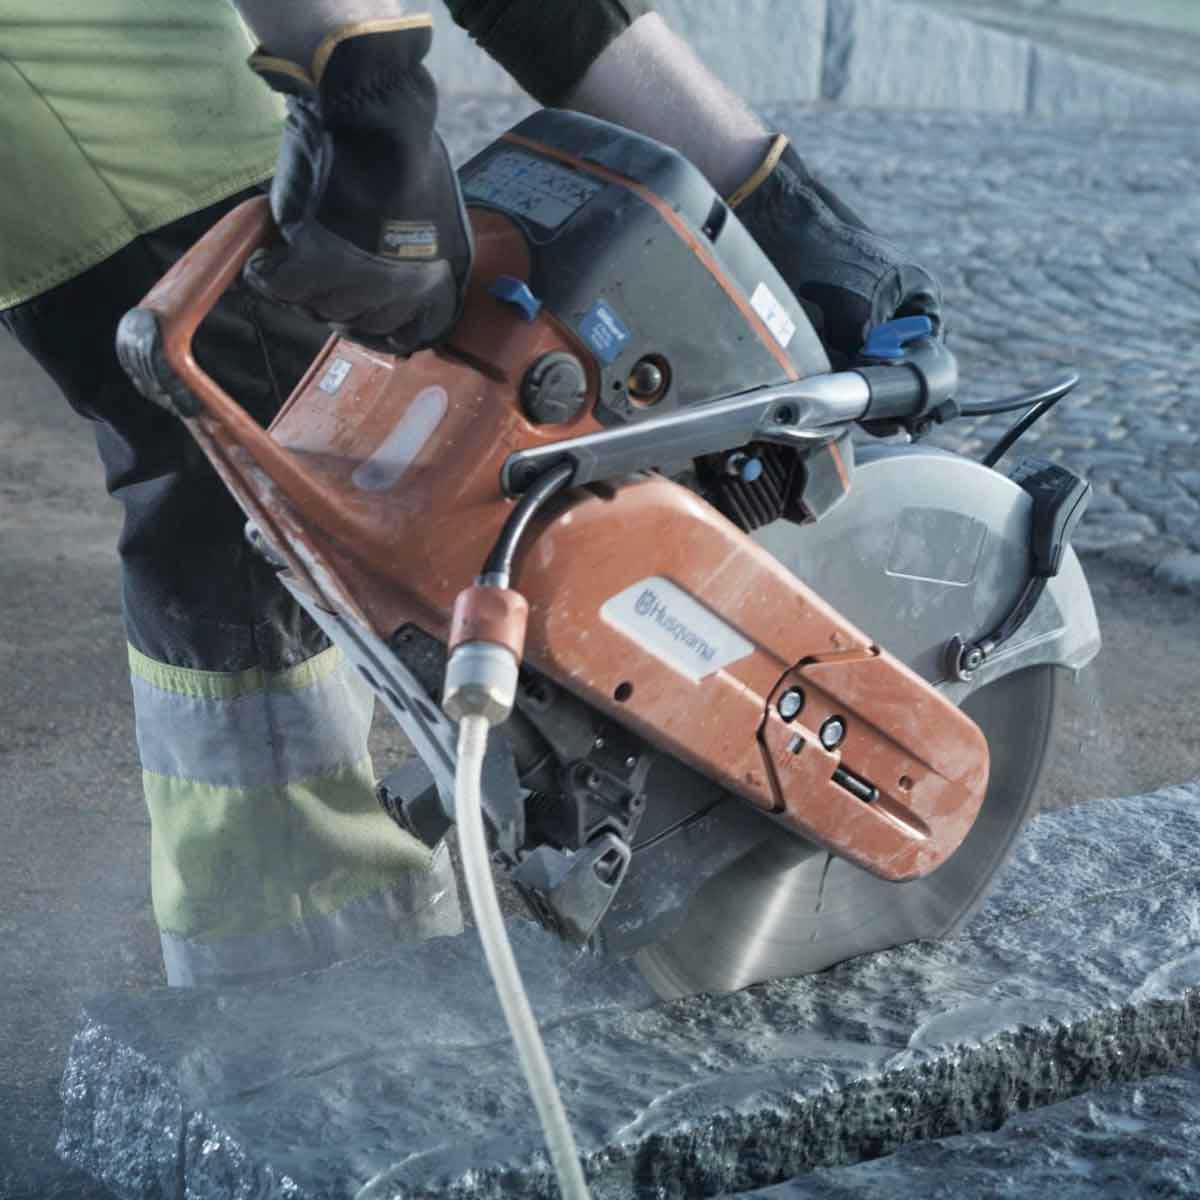 Husqvarna K760 Power cutter action